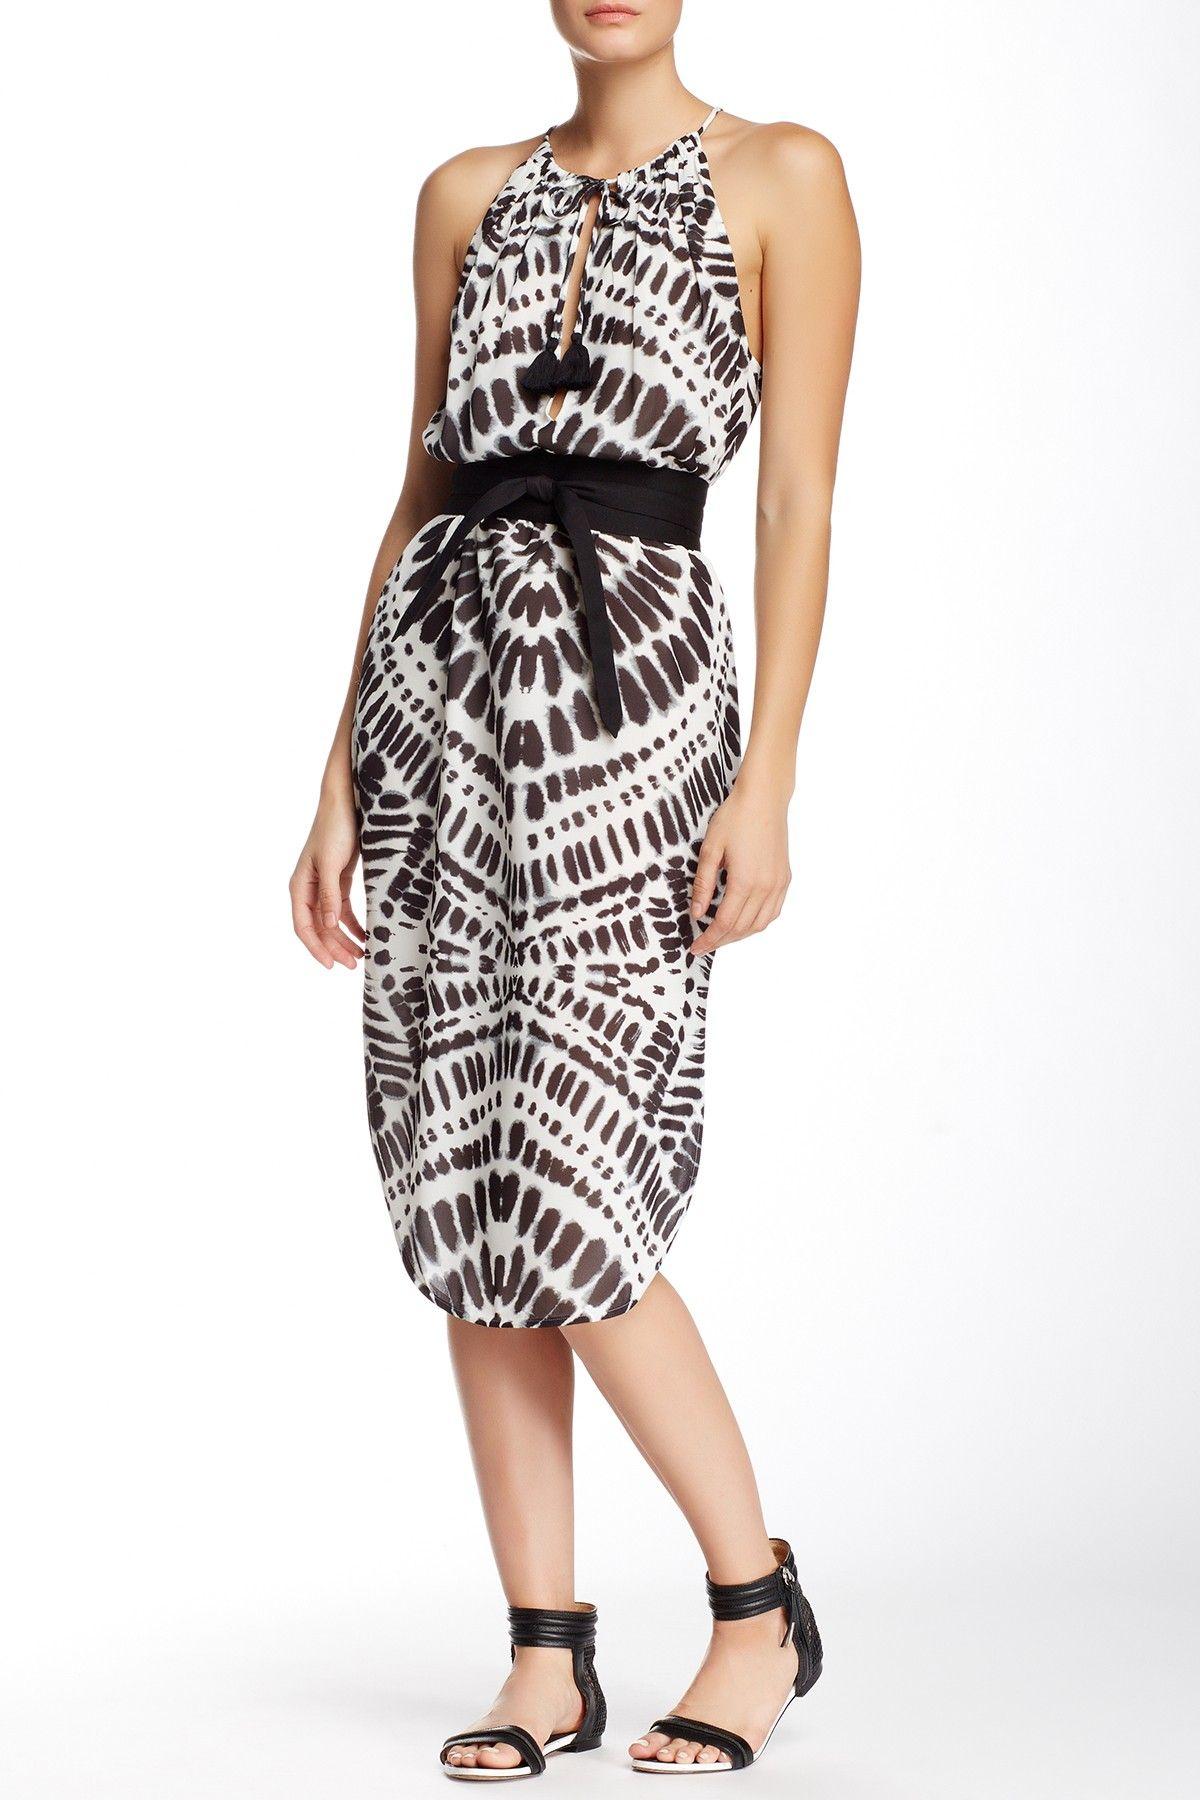 Printed String Strap Slit Dress by L.A.M.B. on @HauteLook